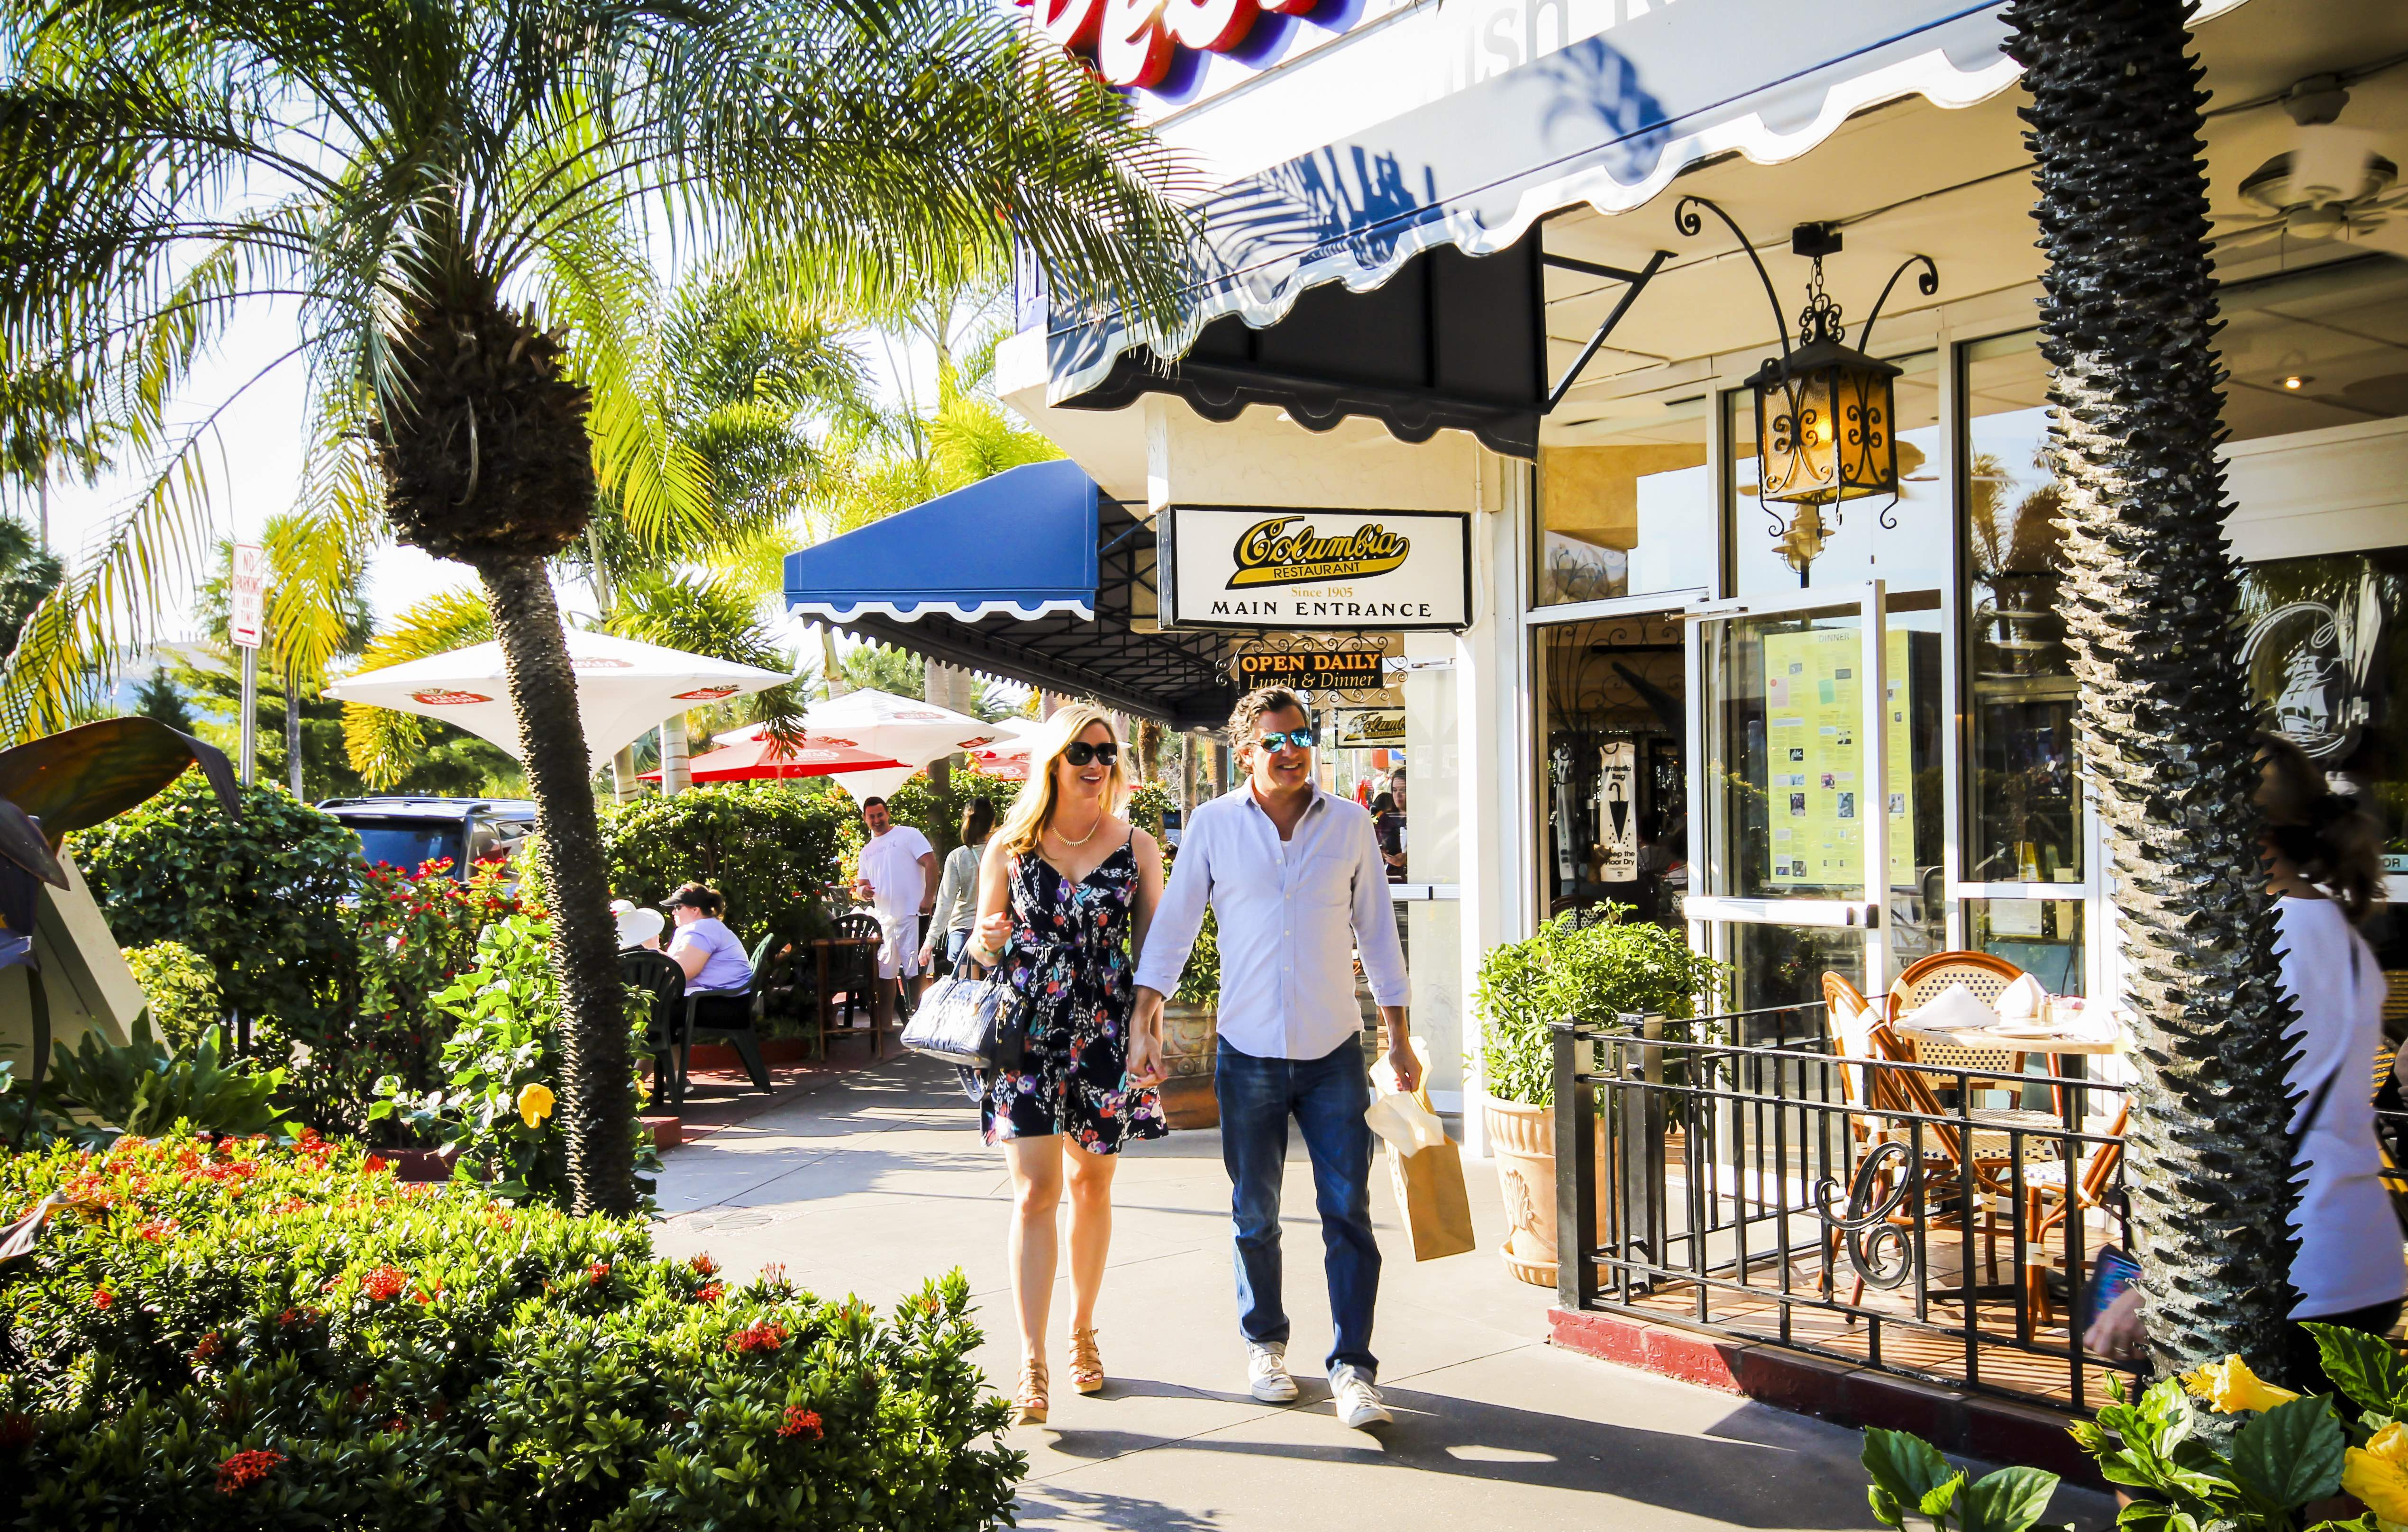 Shopping at St. Armands Circle in Sarasota, Florida